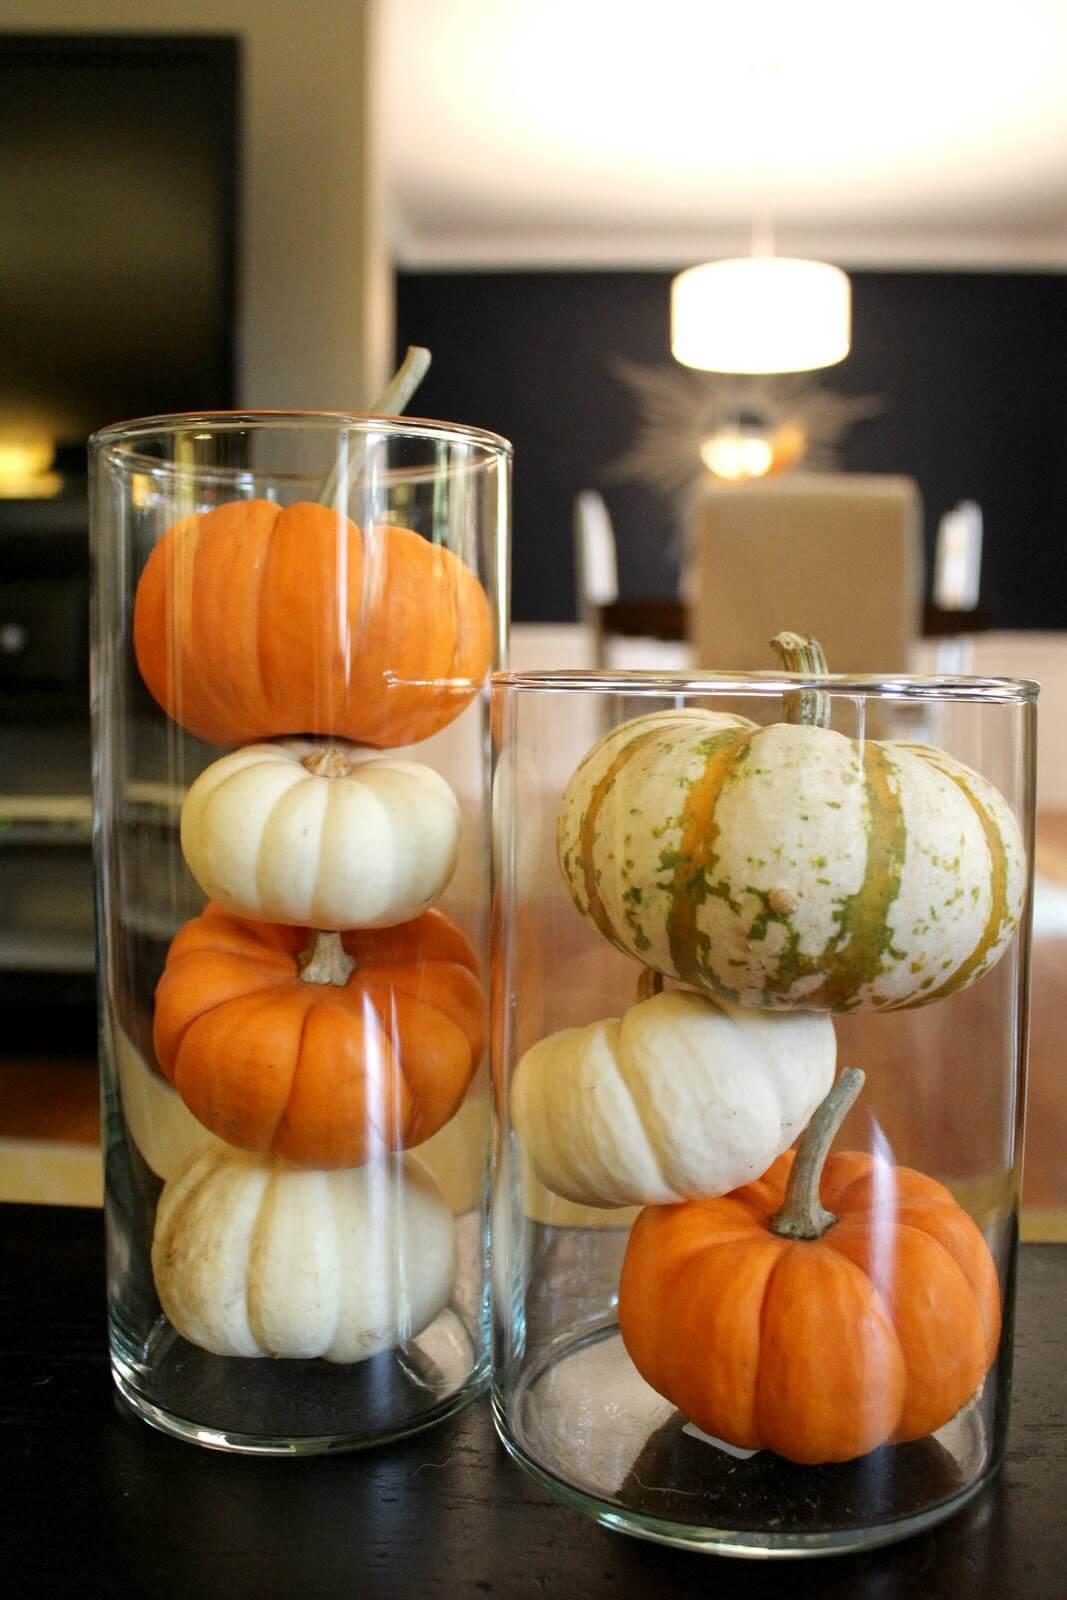 Mini Pumpkin in Large Clear Vase